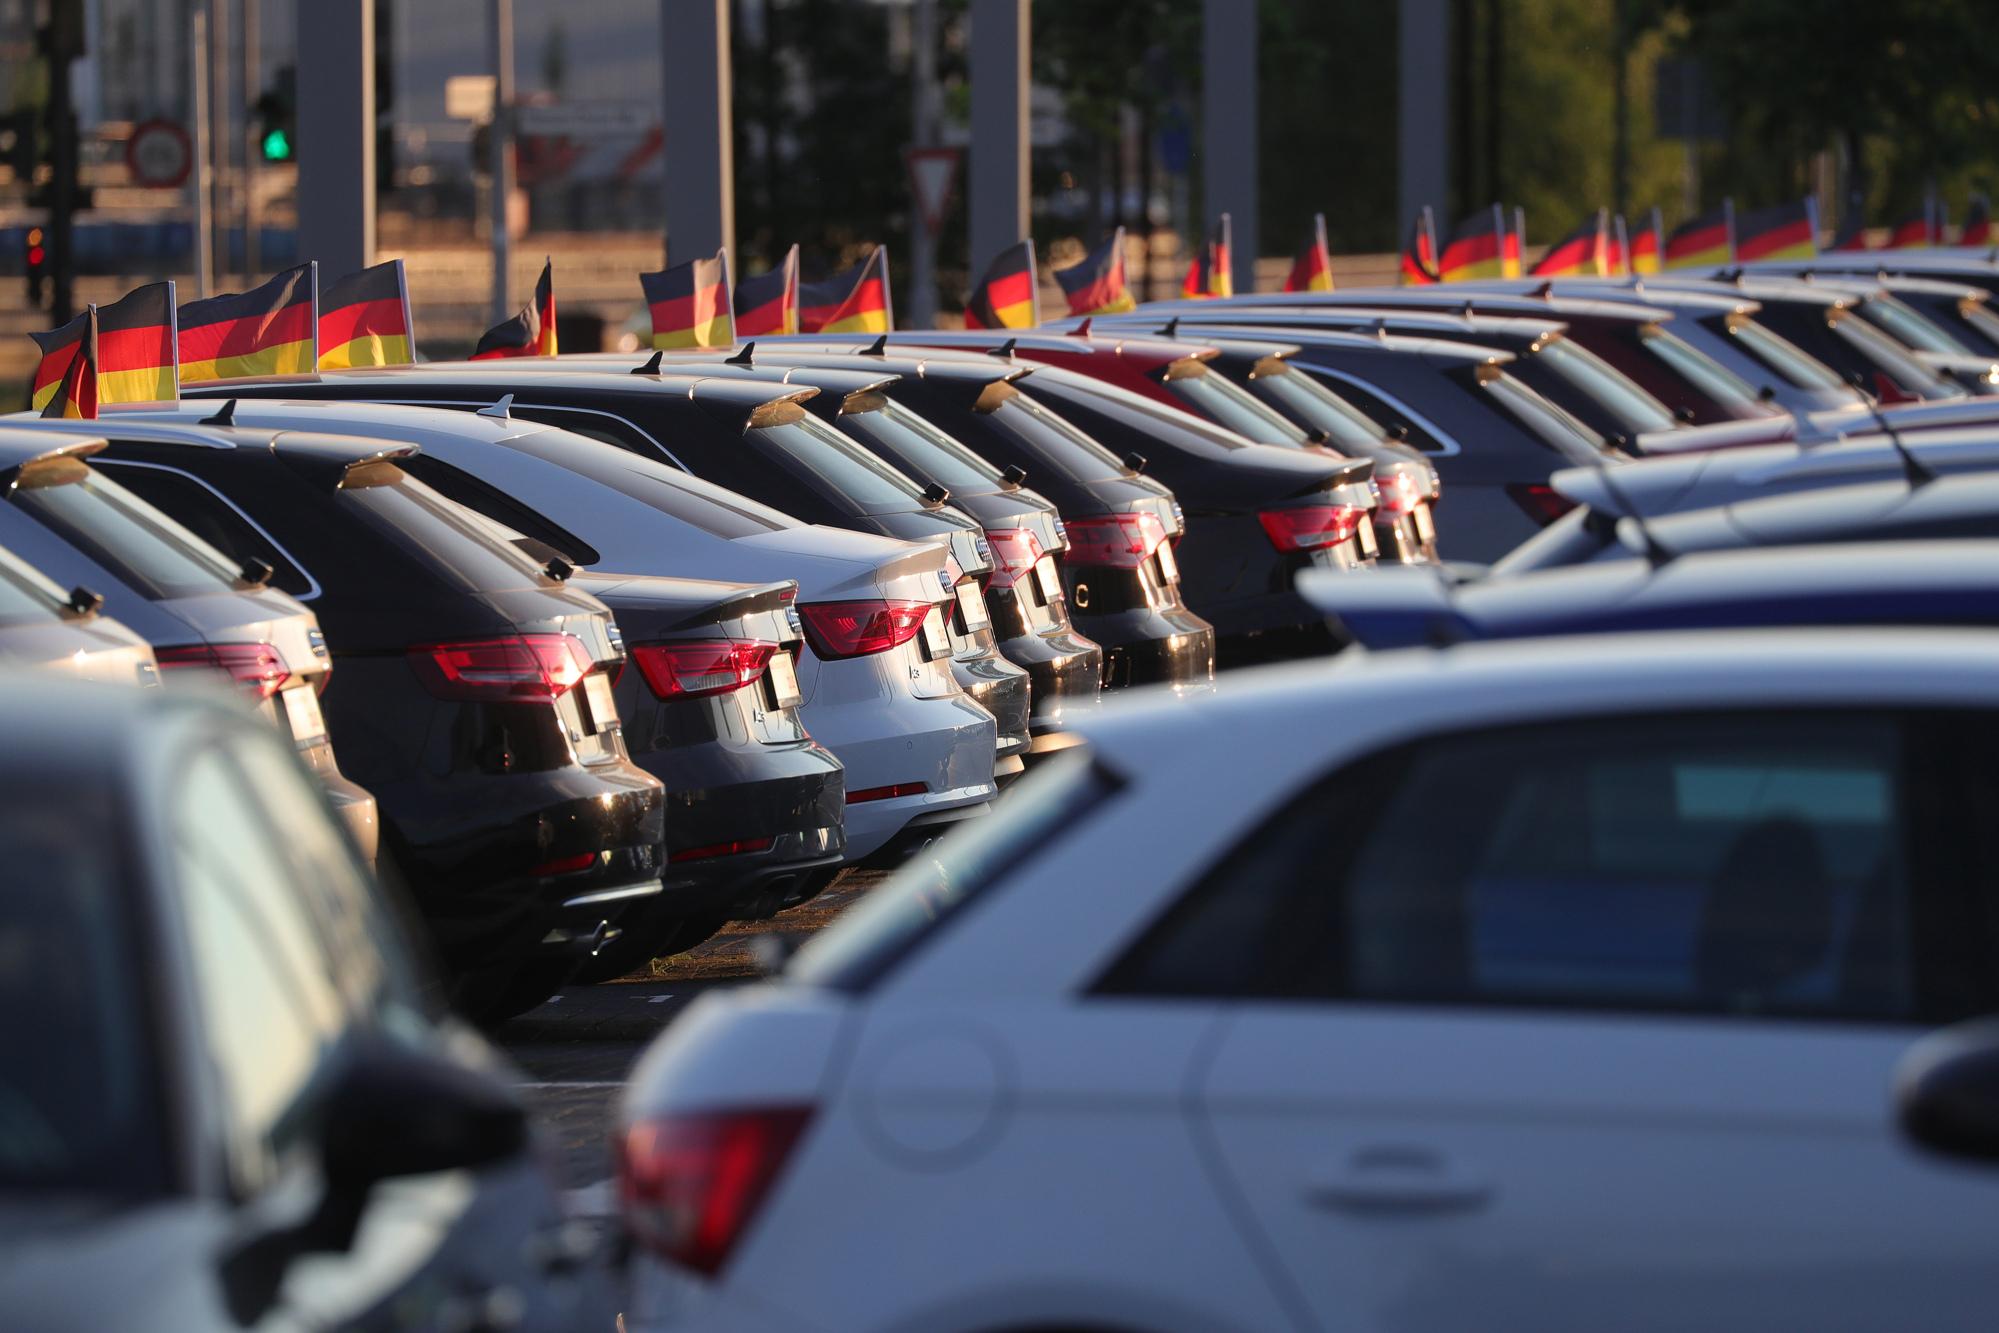 EU Warns of 'Severe Disruption' as Trump Threatens Car Tariffs